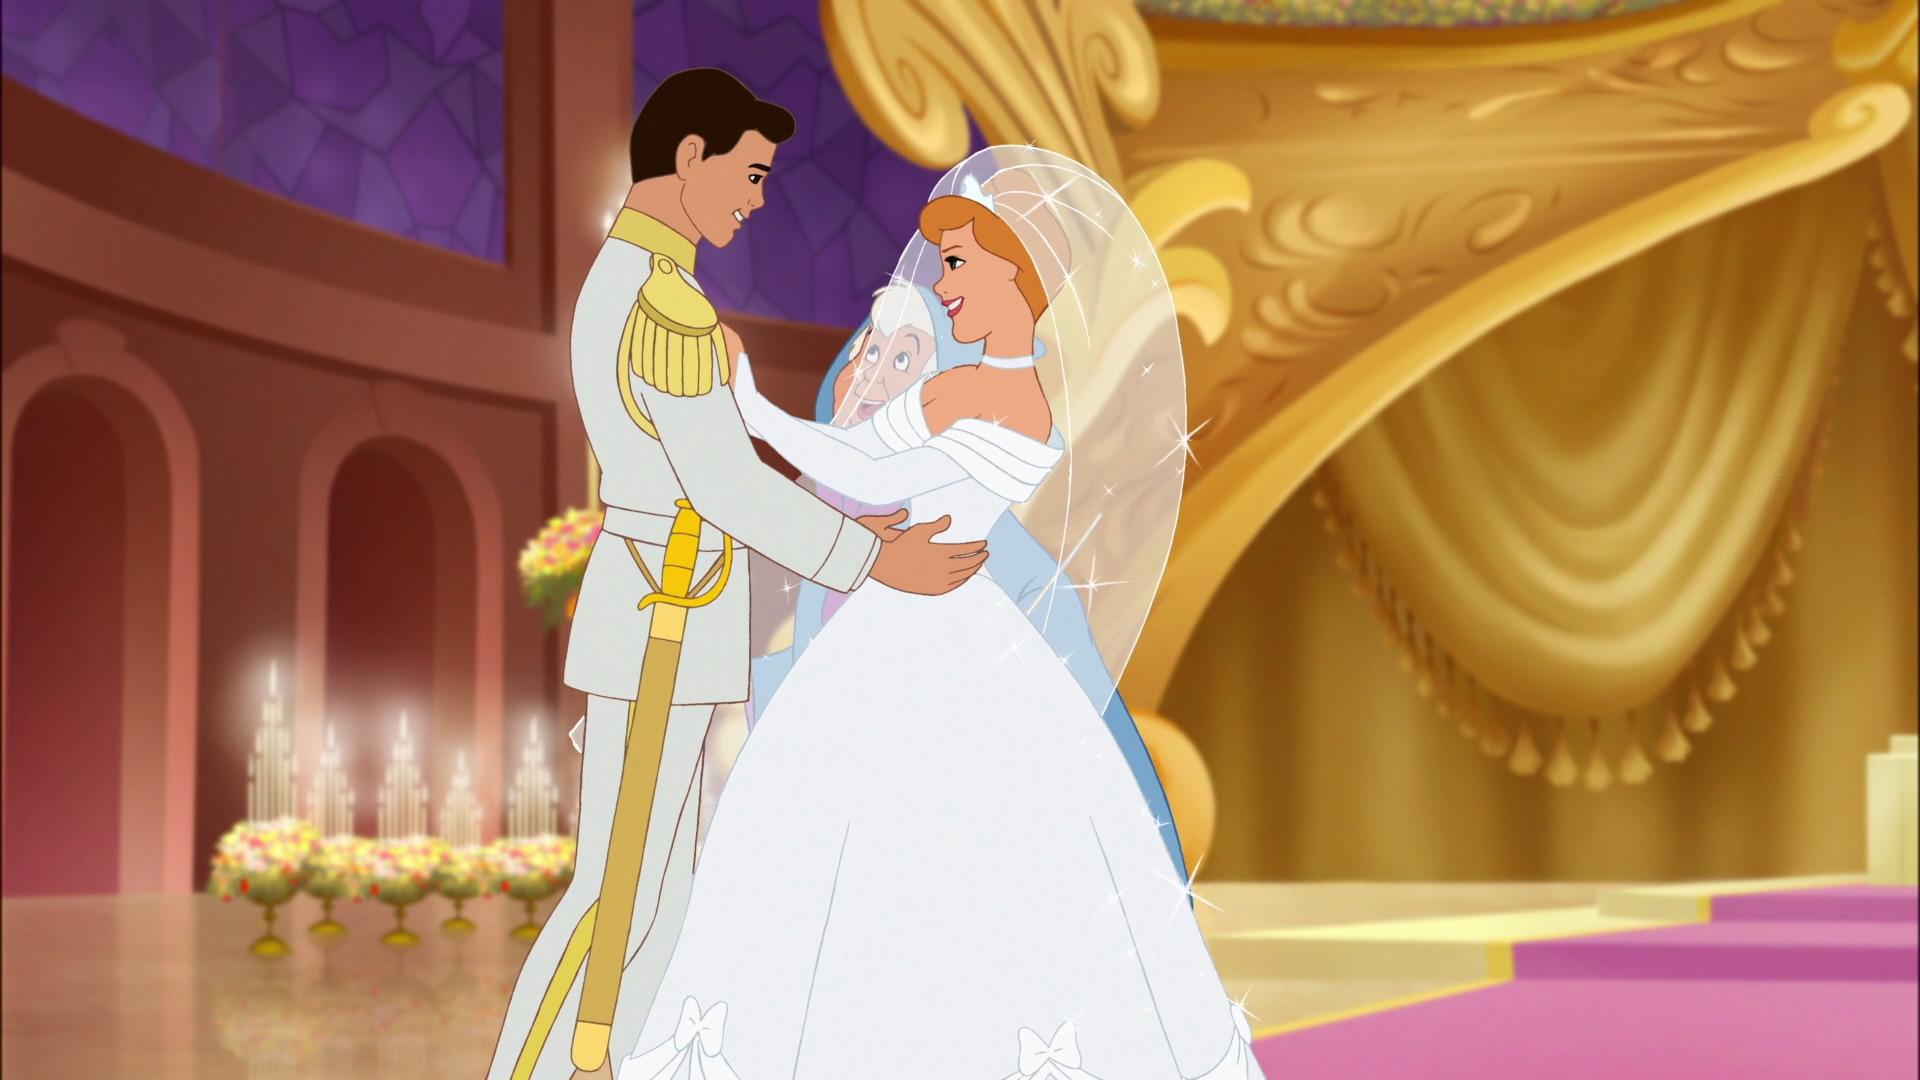 Свадьба золушка и принц фото